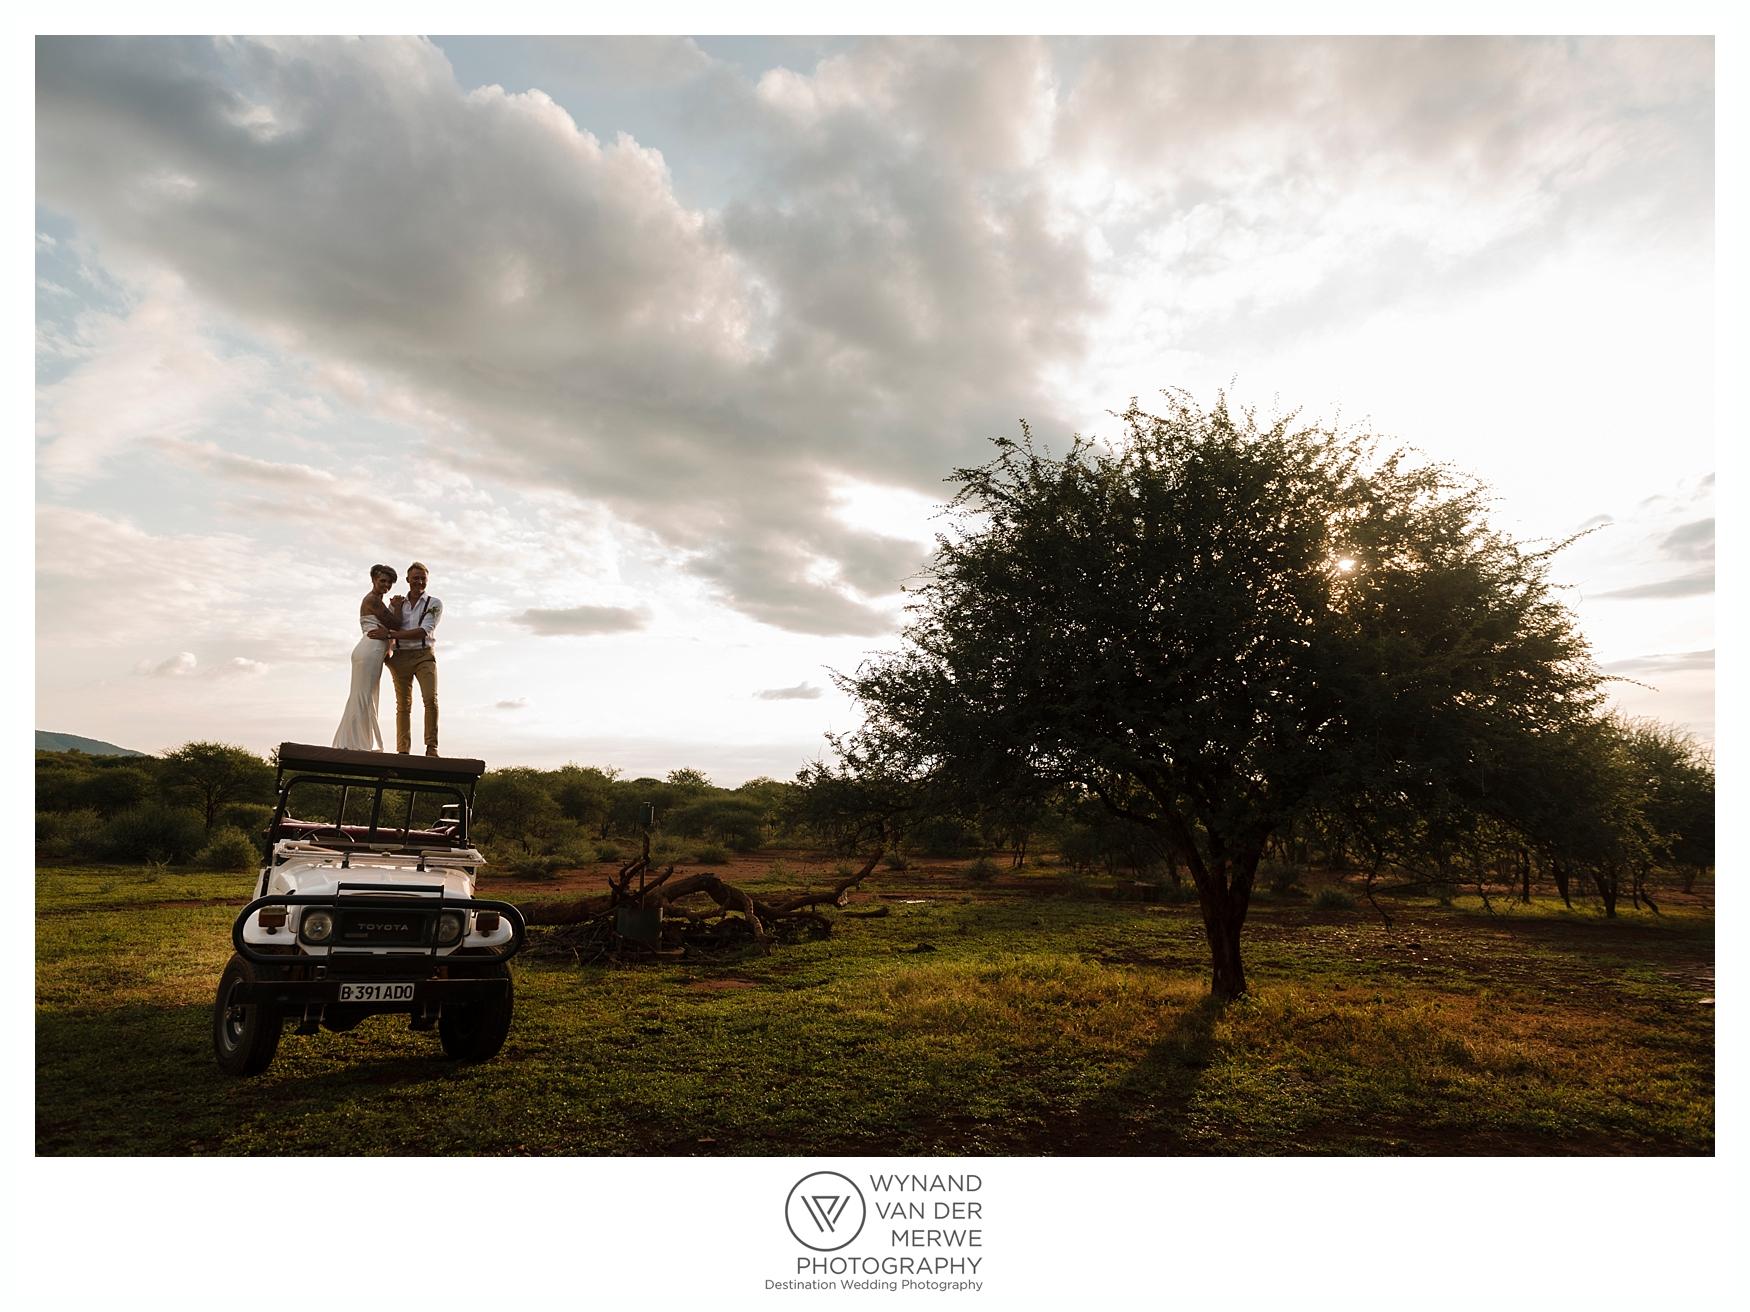 WynandvanderMerwe_weddingphotography_bushveldwedding_northam_bushveld_limpopowedding_limpopo_southafrica-214.jpg